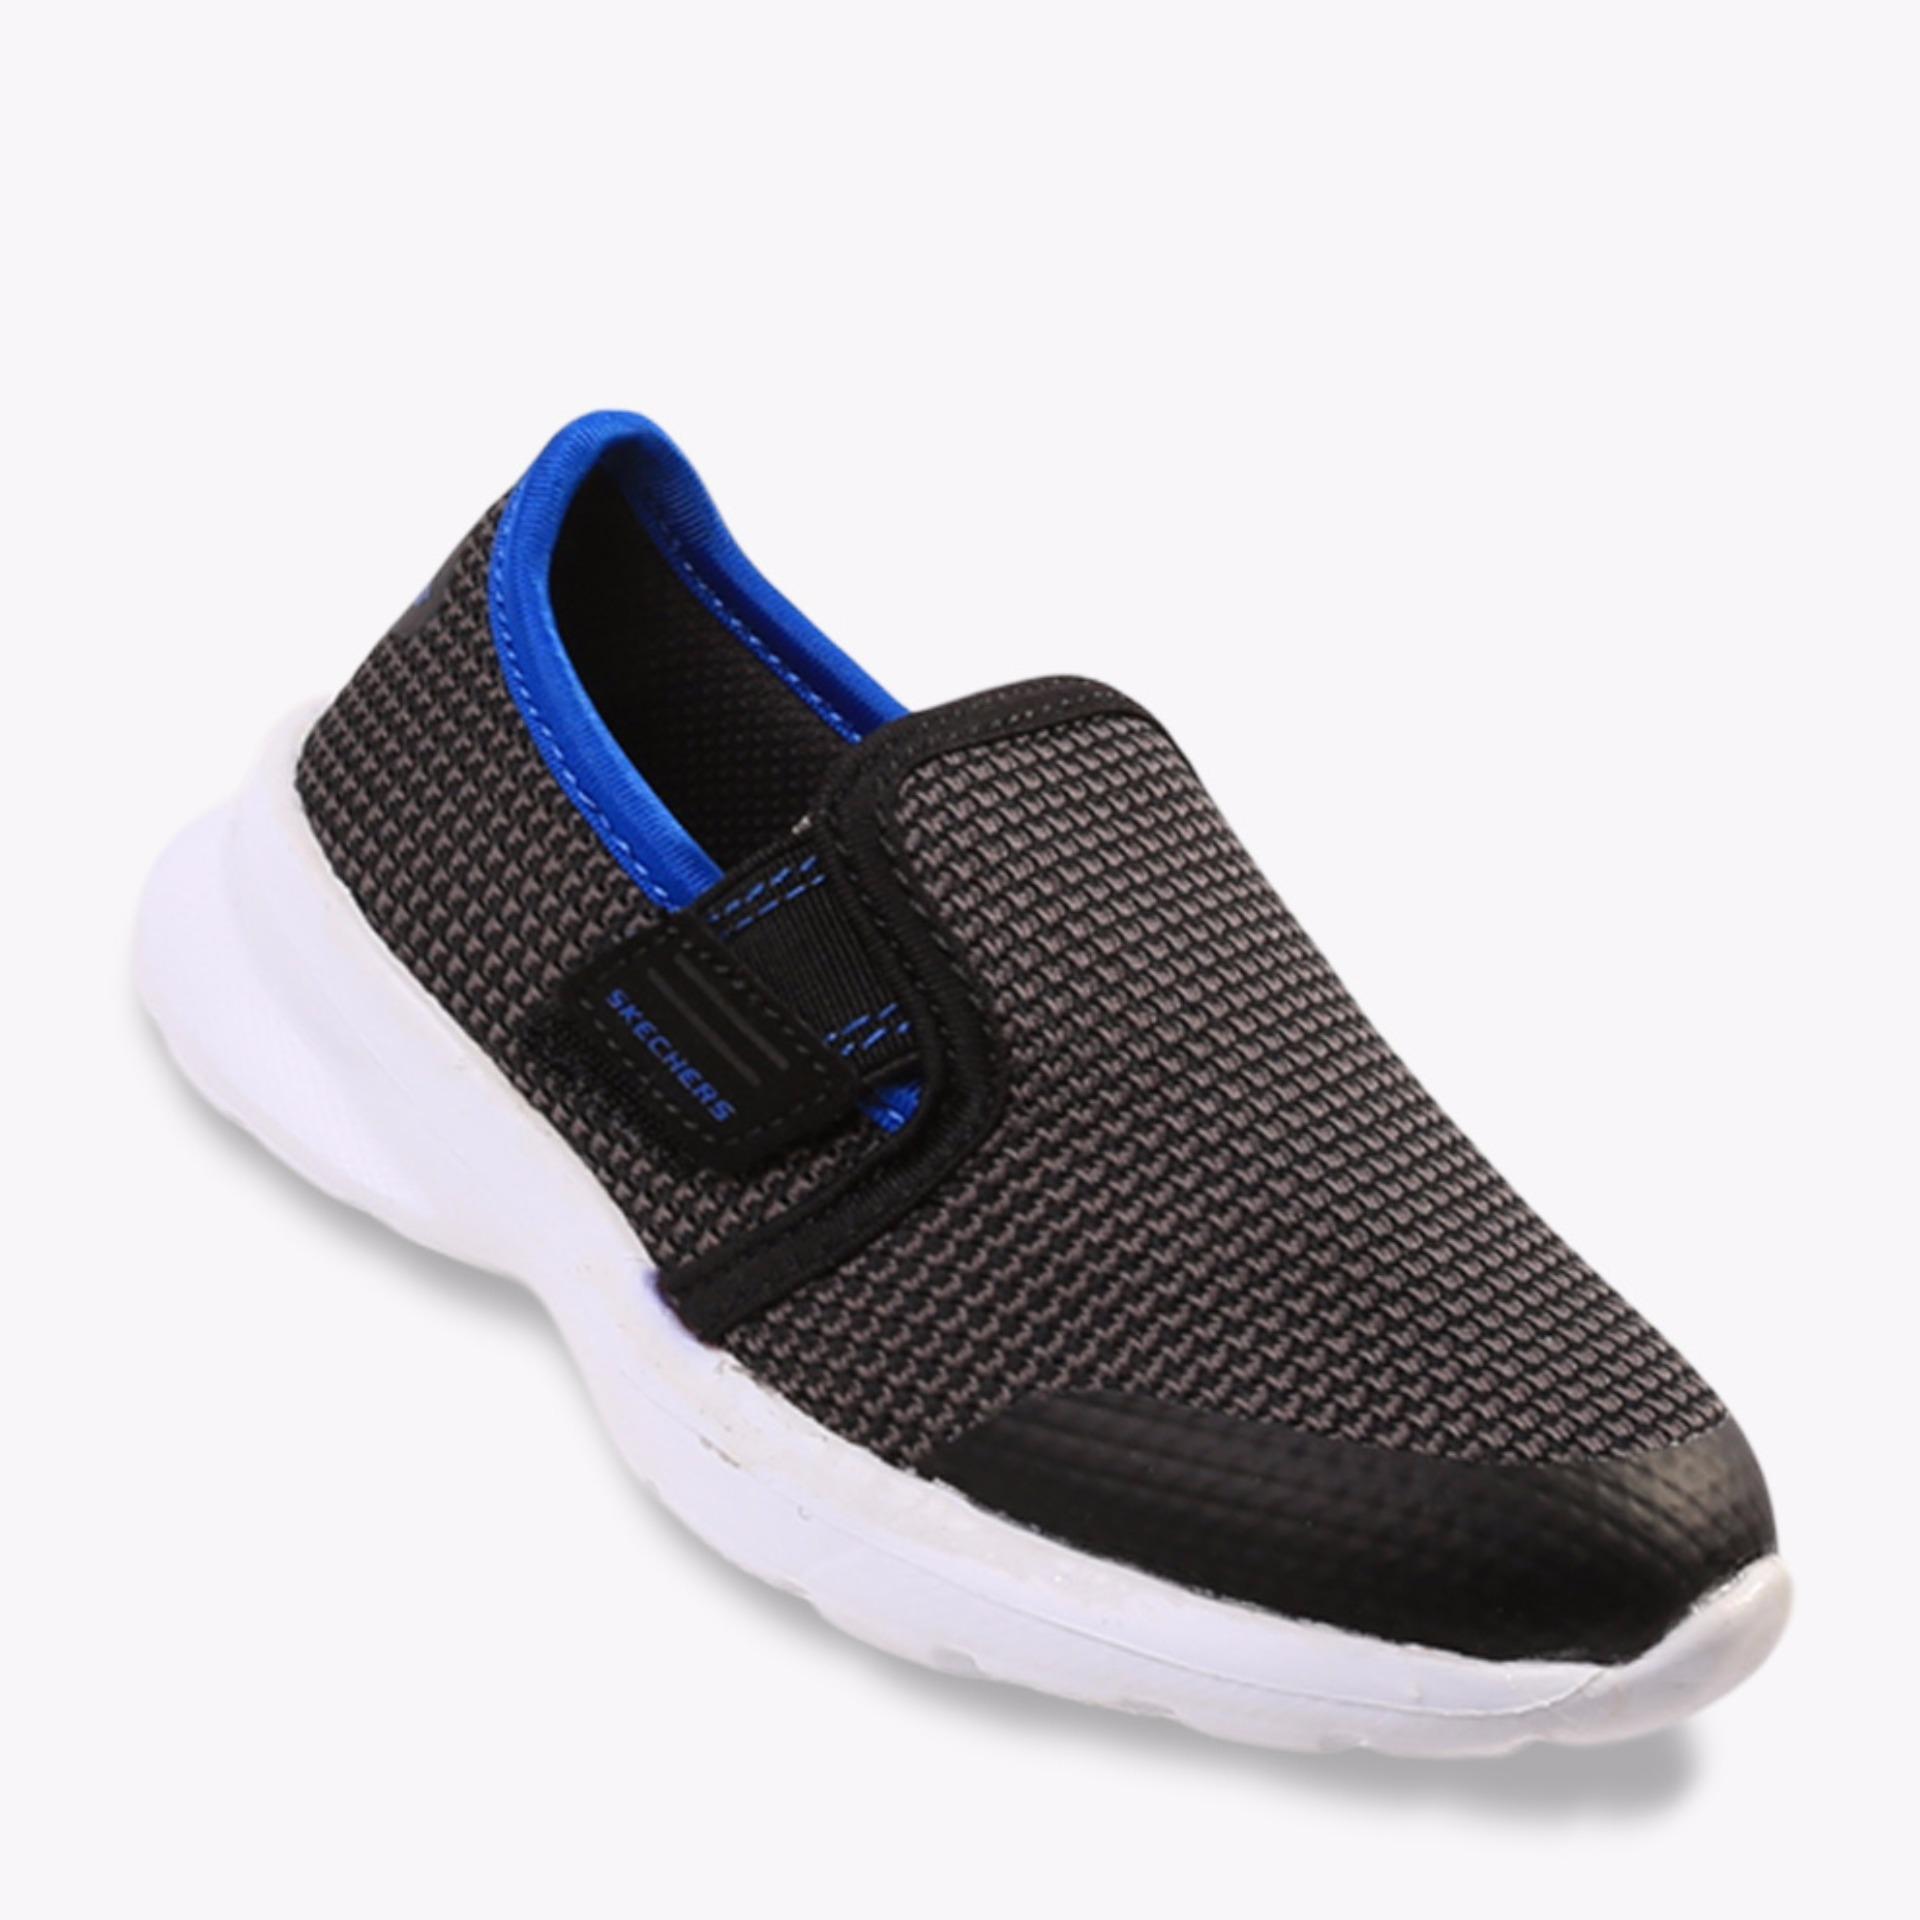 Skechers Skech Stepz - Power Stride Boys's Sneakers Shoes - Abu-Abu